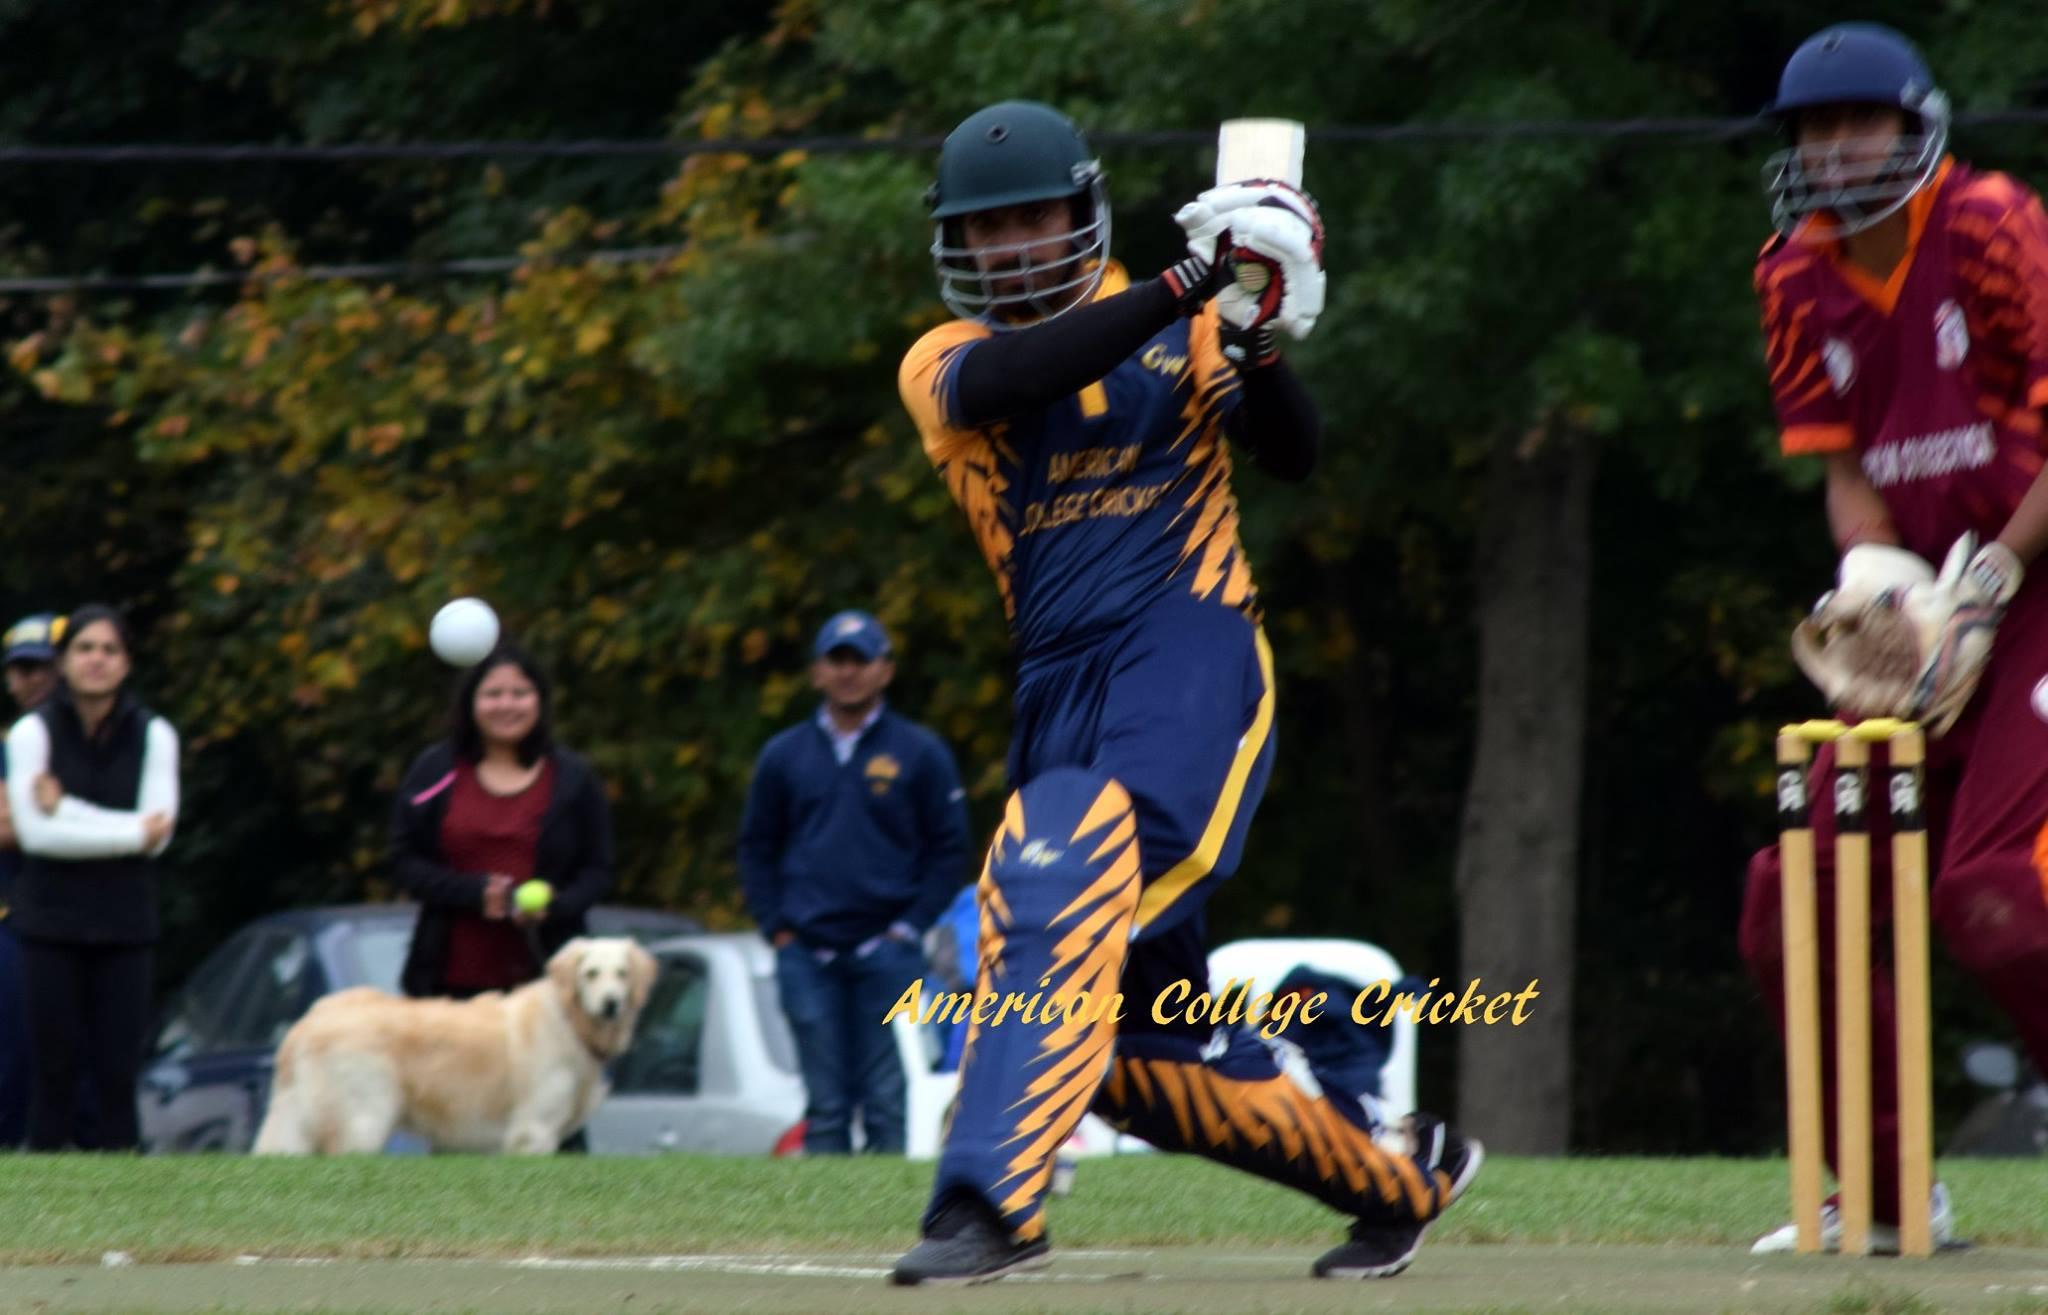 American College Cricket